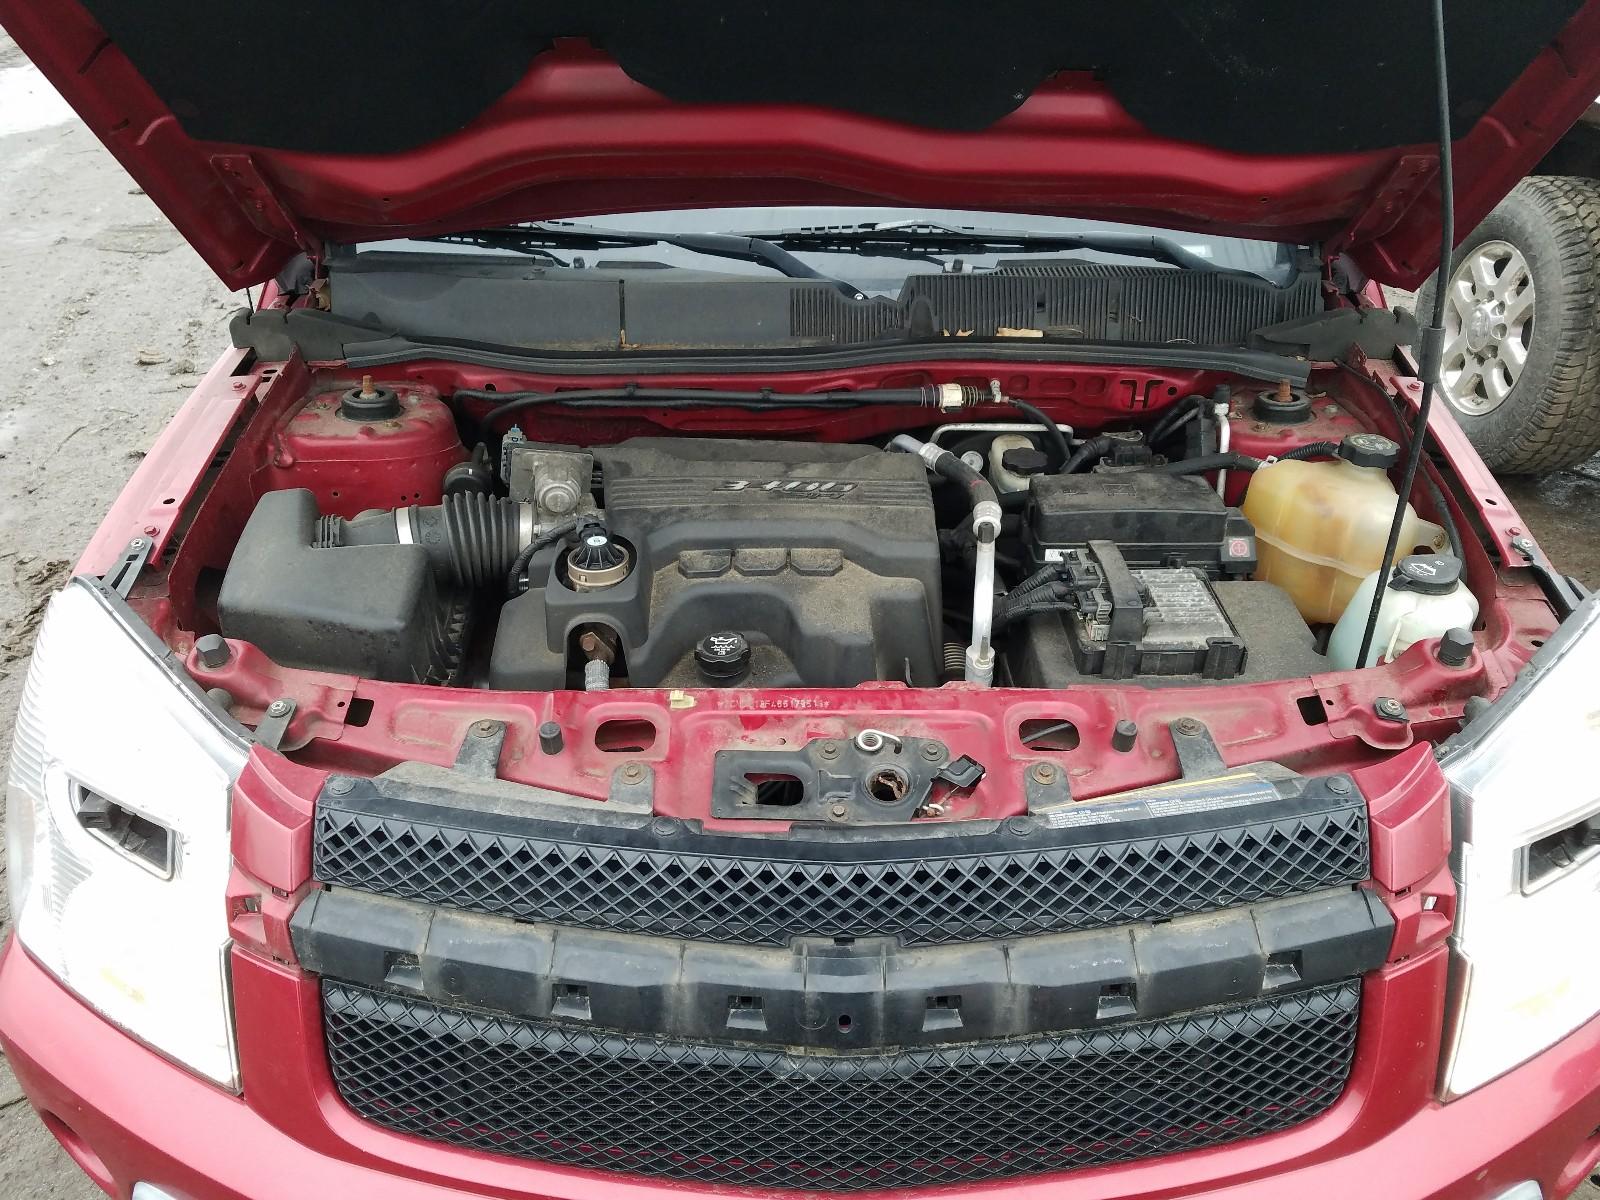 2CNDL13F466179511 - 2006 Chevrolet Equinox Ls 3.4L inside view